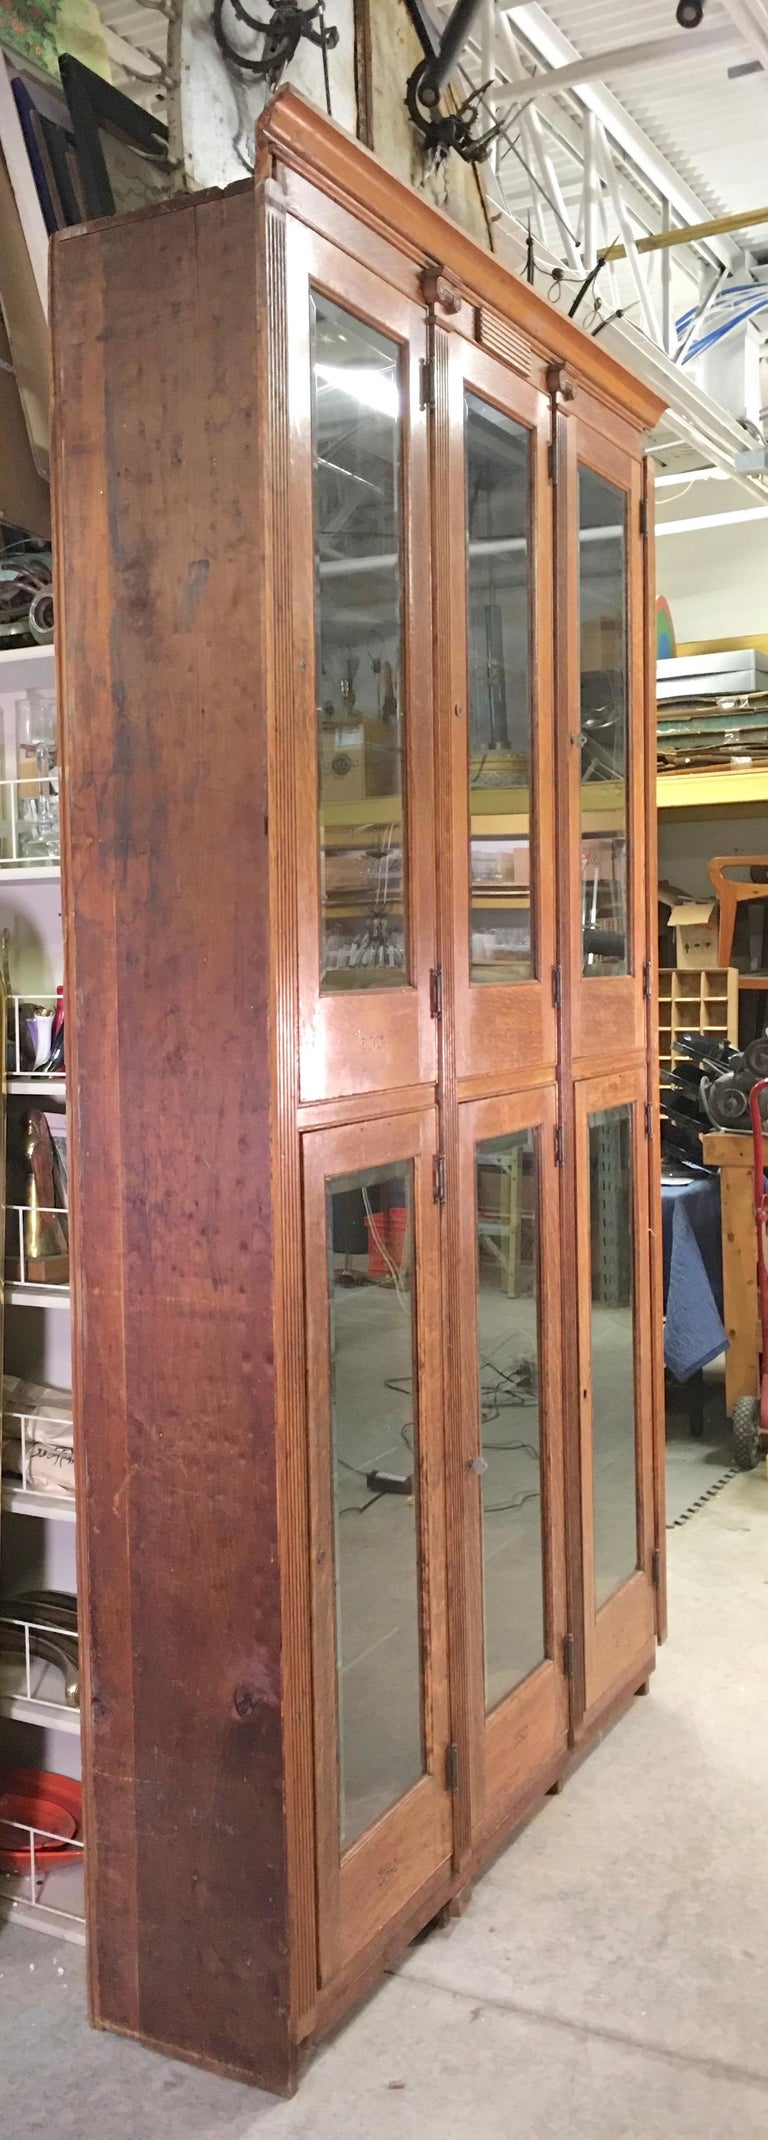 19th Century American Oak & Glass Six-Door Cupboard For Sale 10